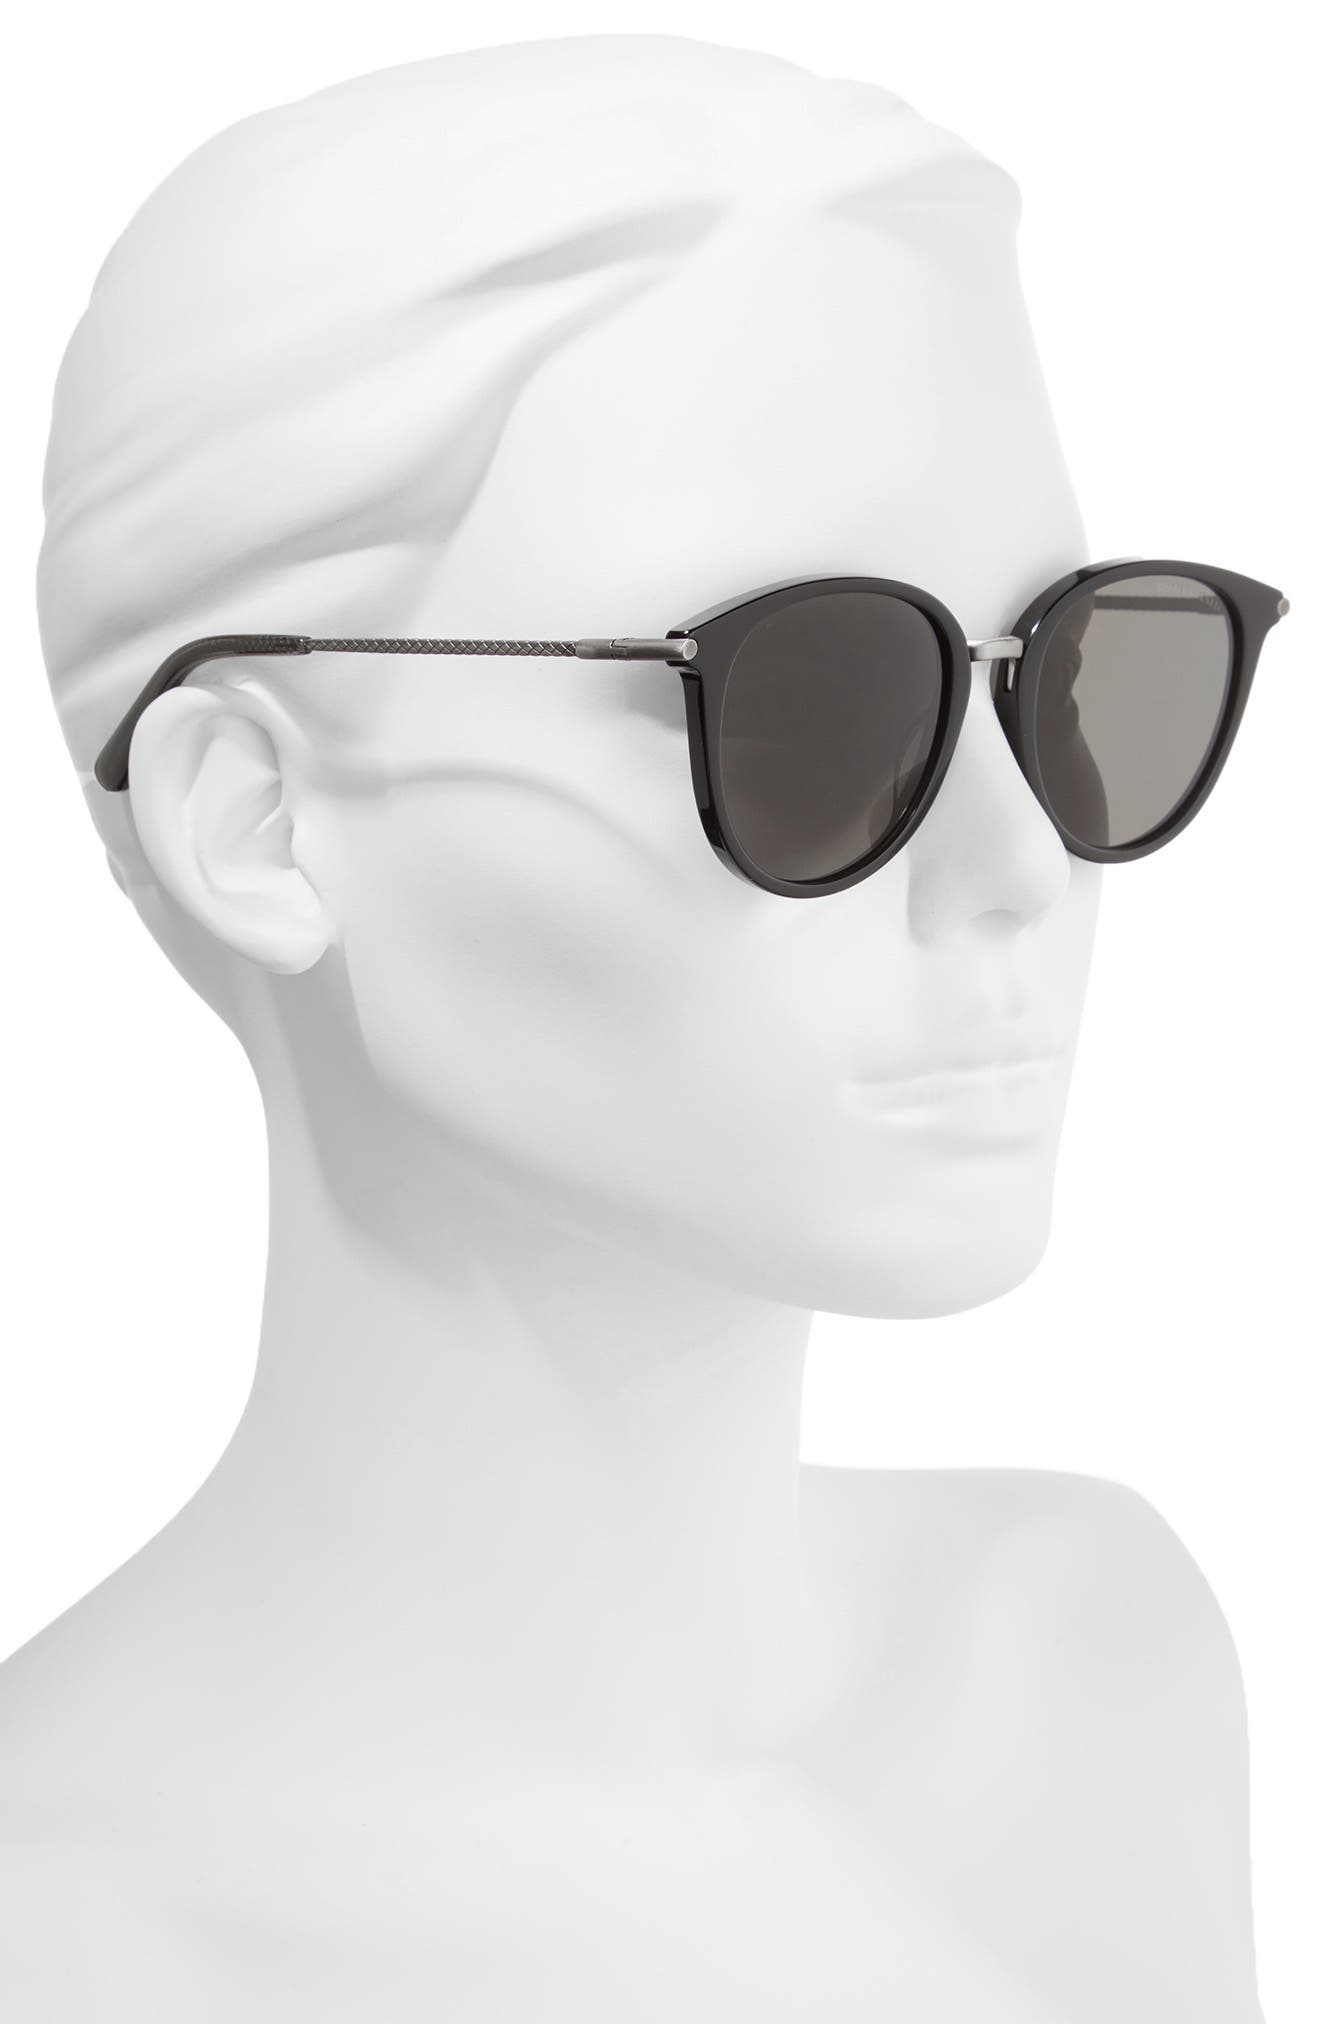 53mm Sunglasses,                             Alternate thumbnail 2, color,                             GREY/ SILVER